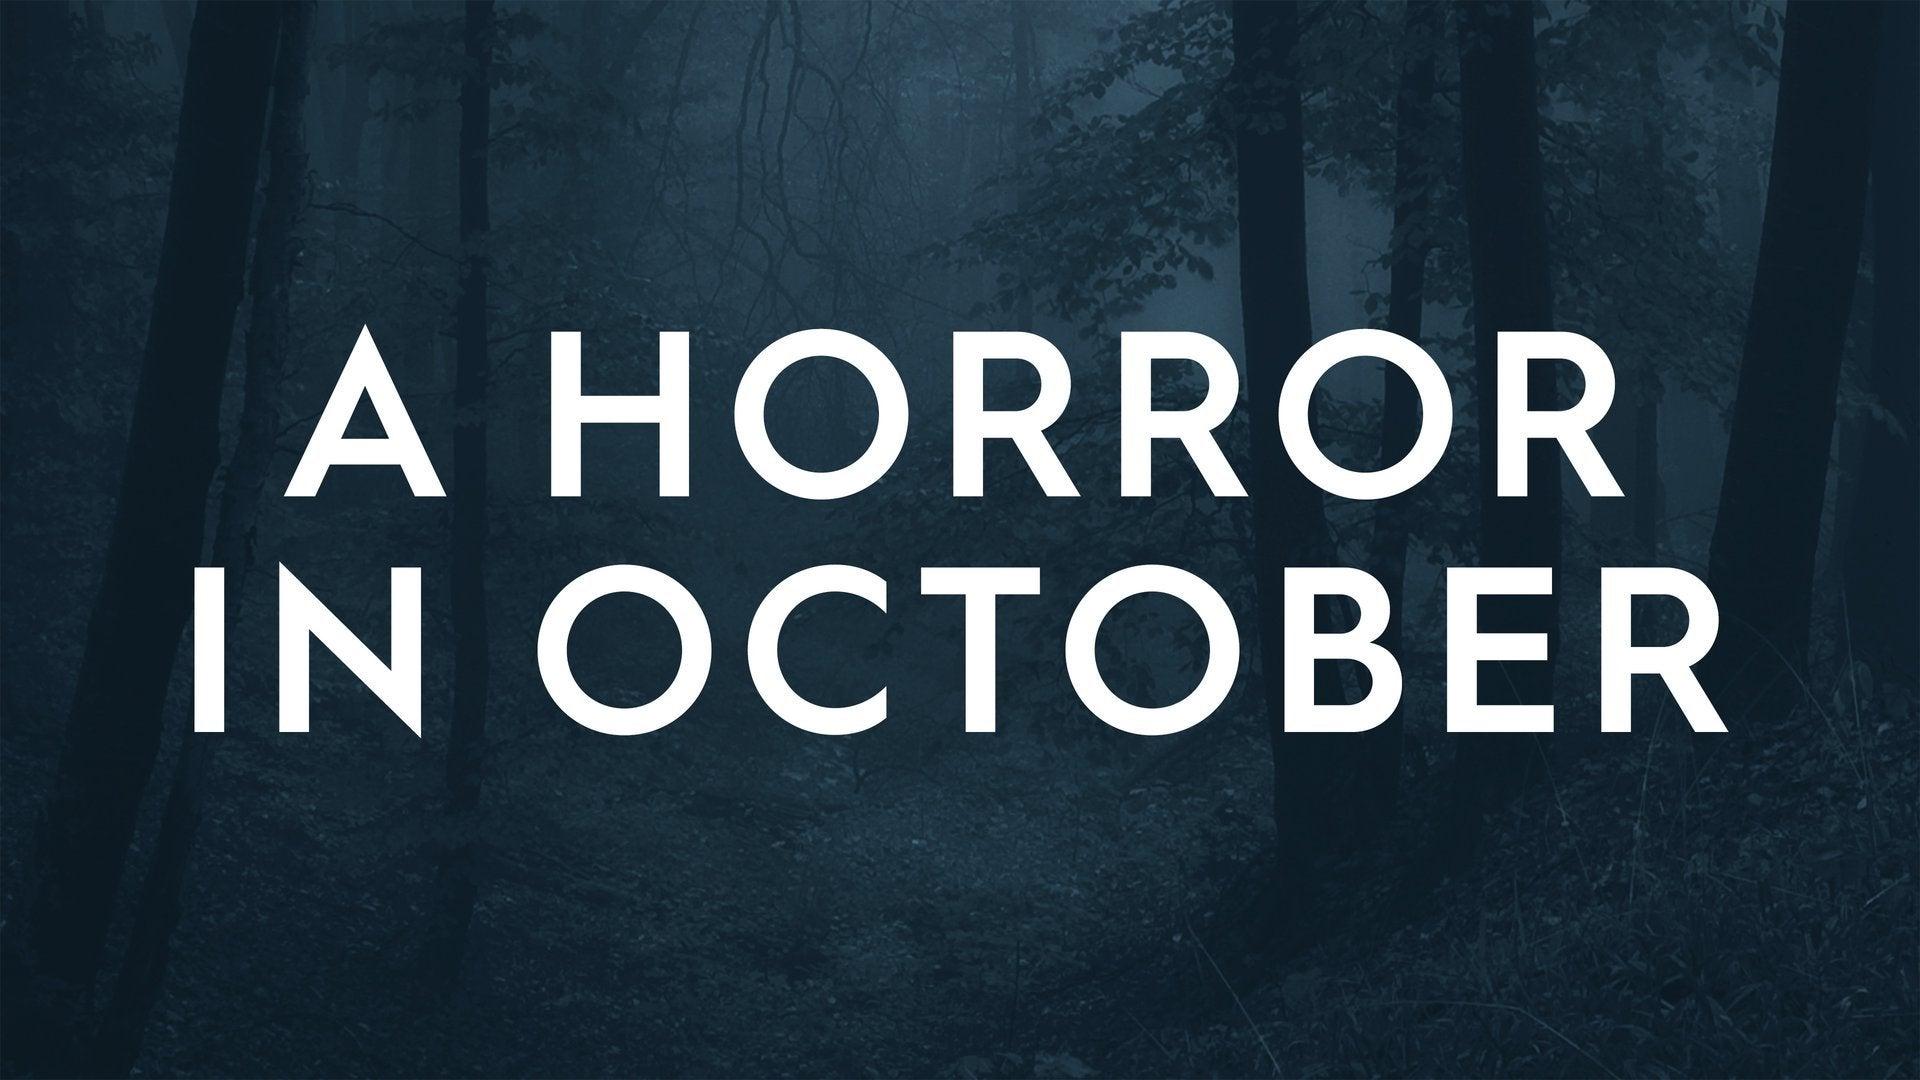 A Horror in October